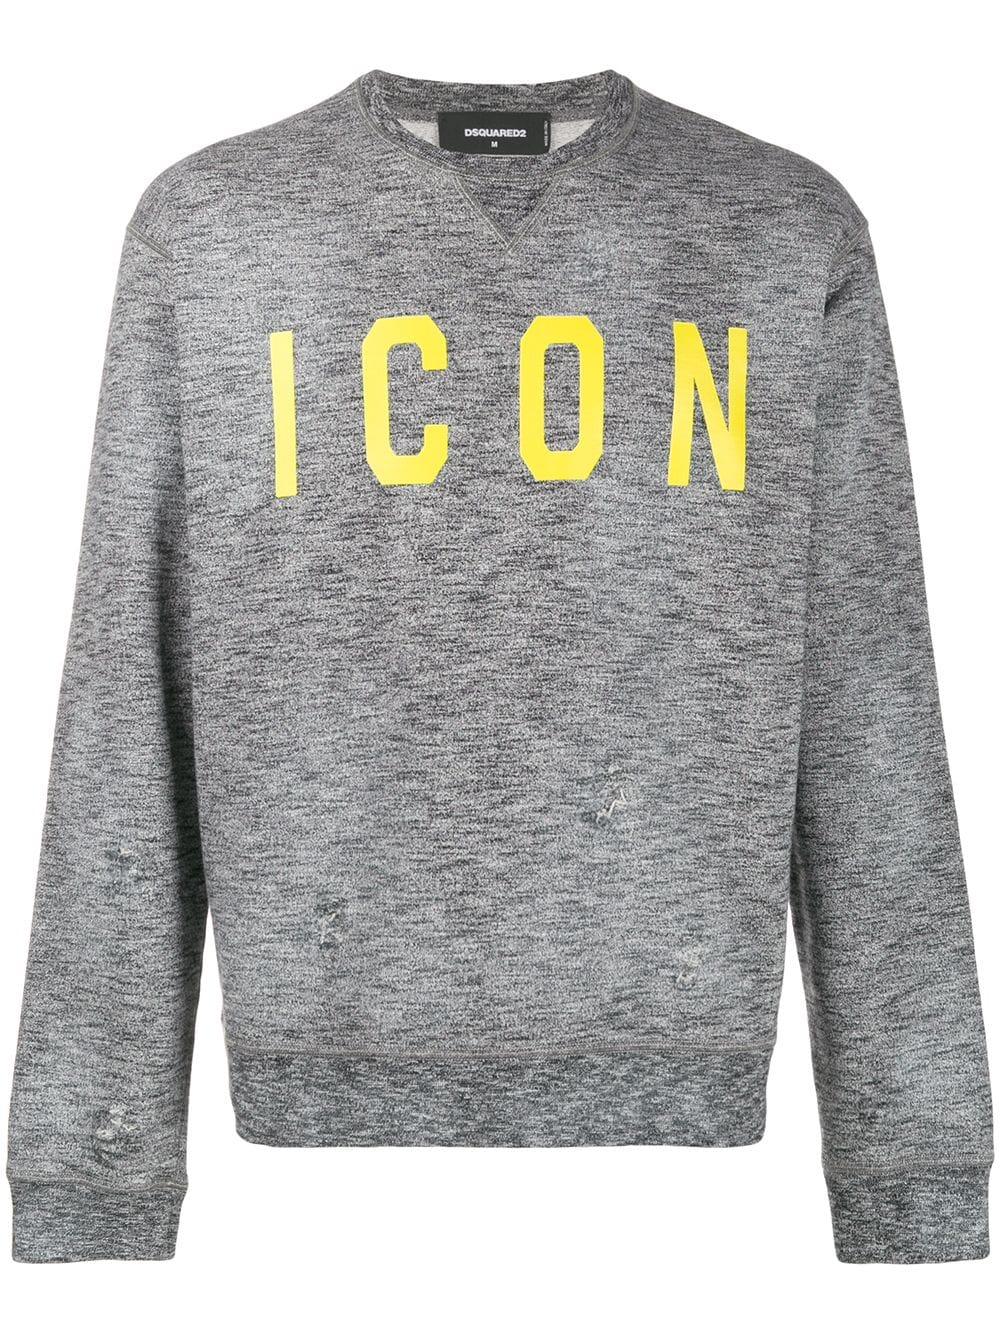 Dsquared2 Dsquared2 Icon Sweatshirt Grey Dsquared2 Cloth [ 1334 x 1000 Pixel ]